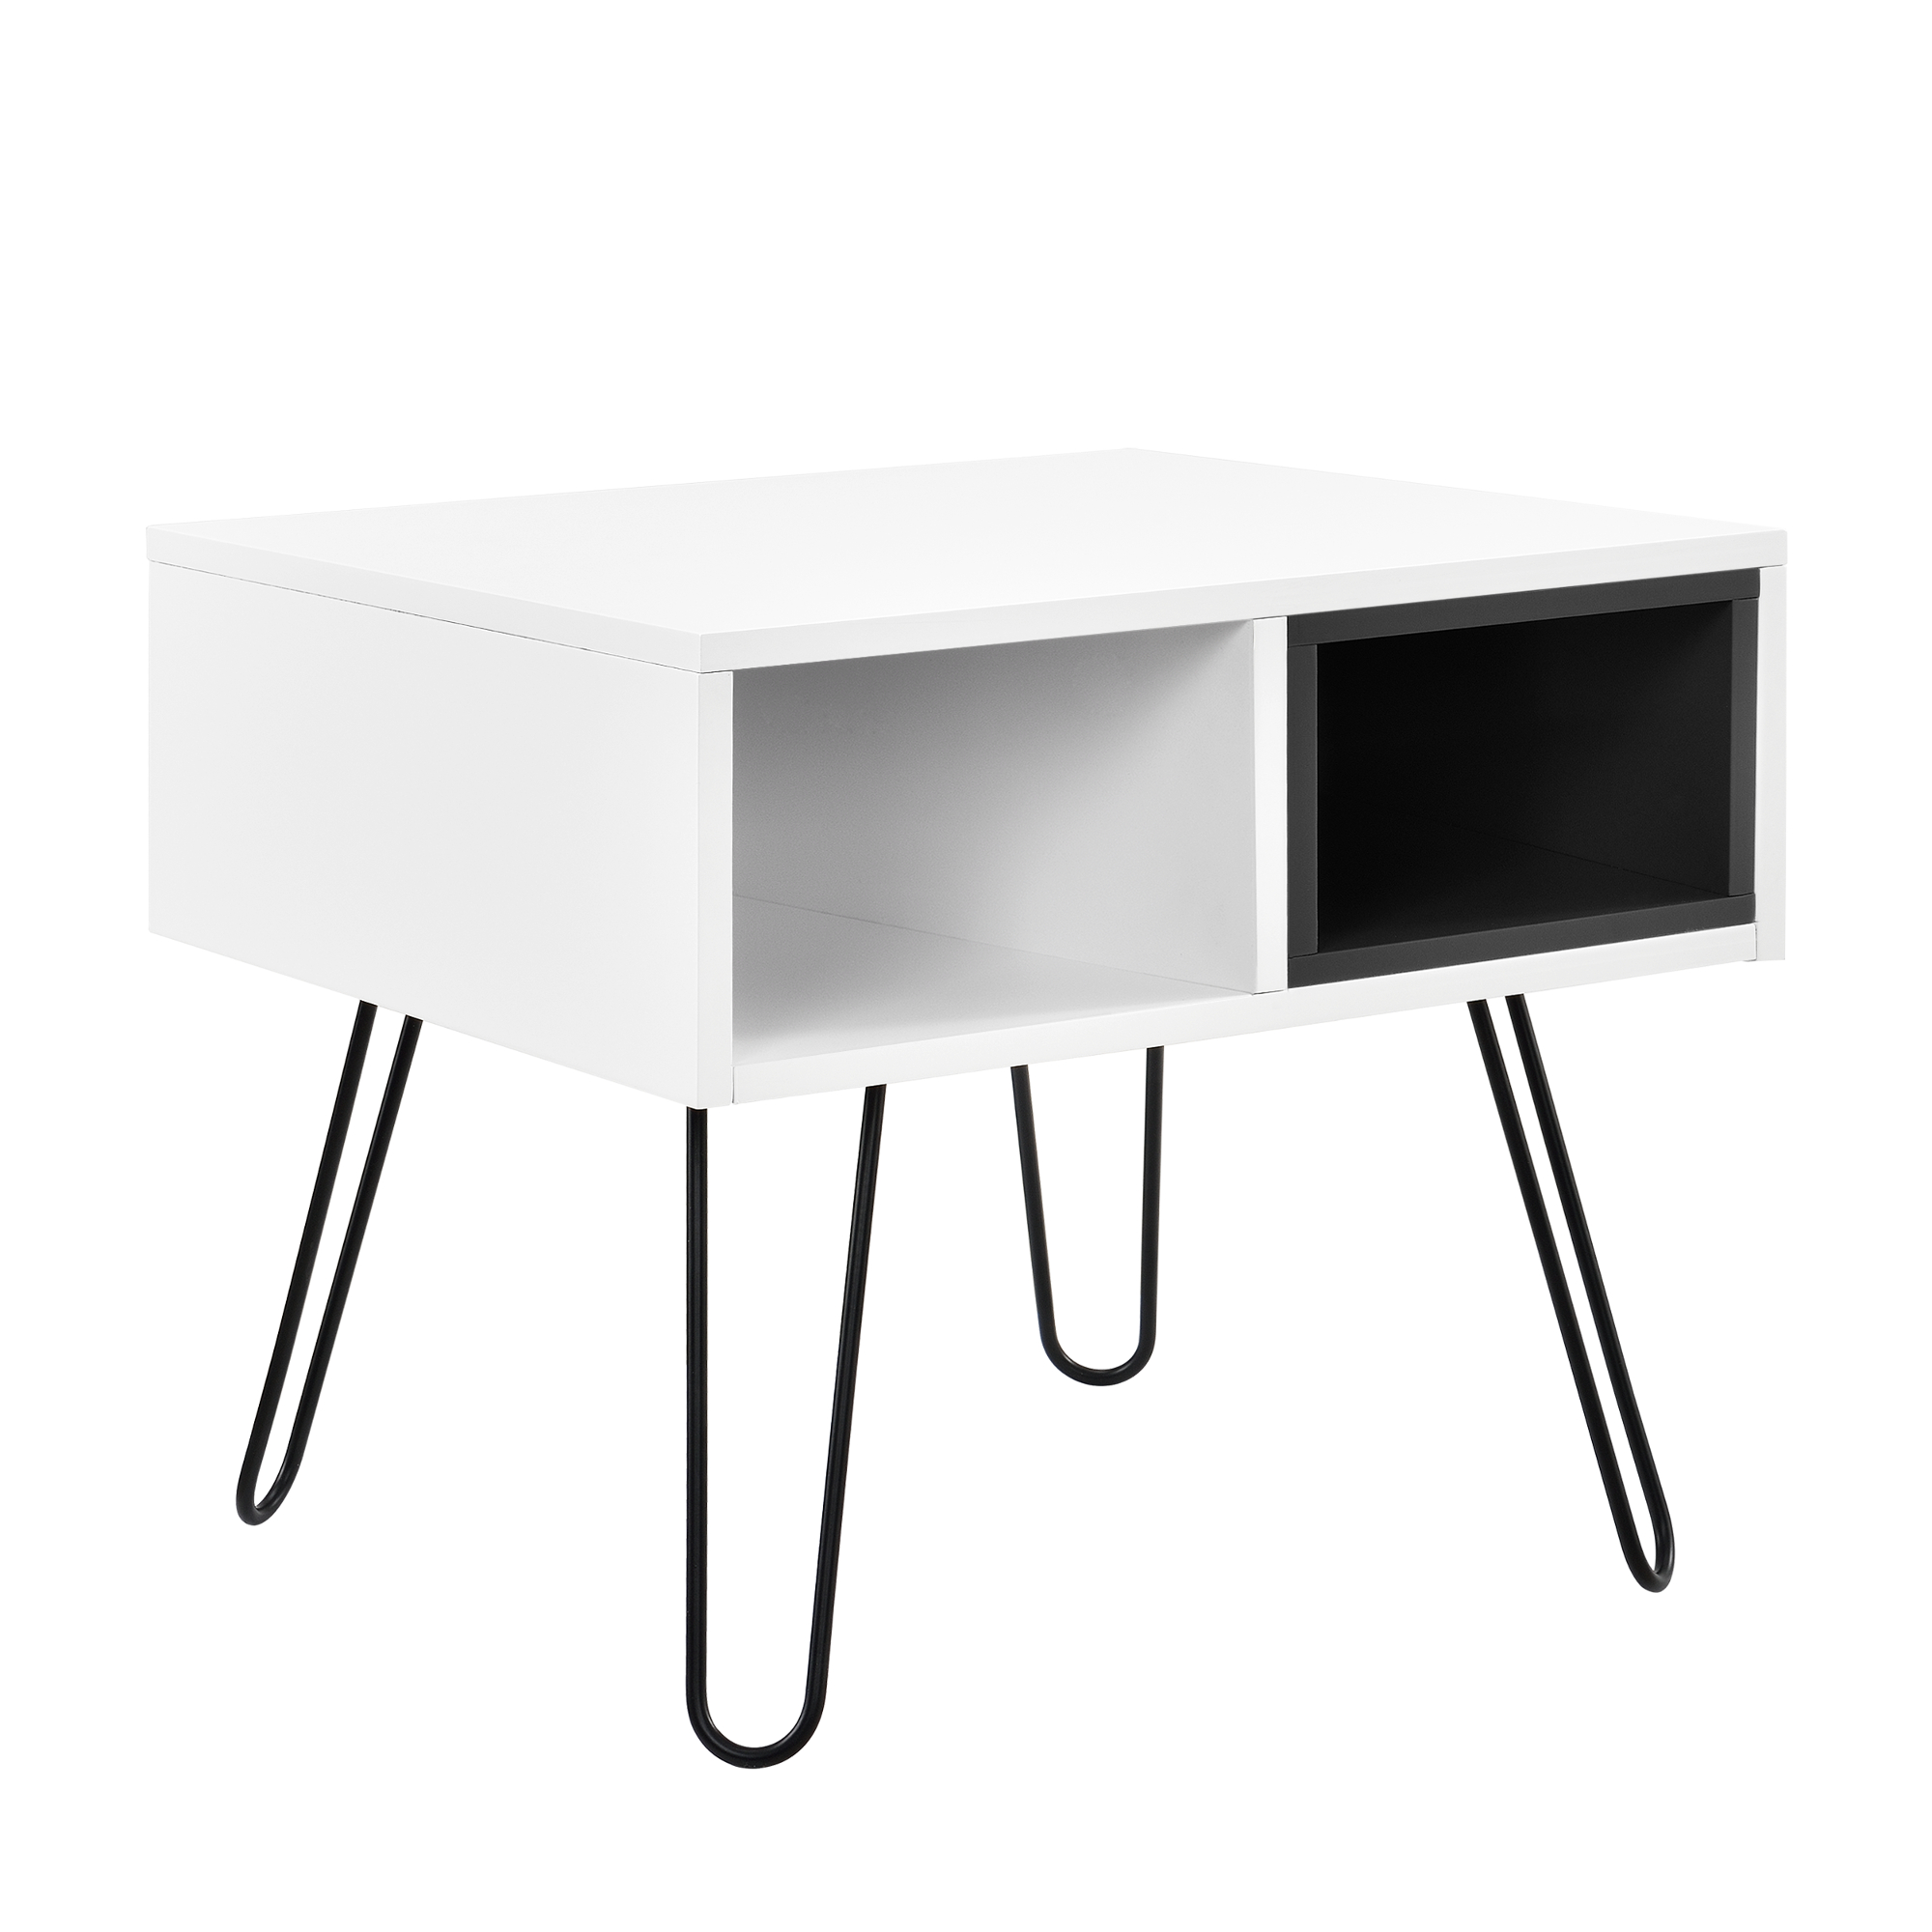 design table d 39 appoint blanc console armoire table de chevet r tro ebay. Black Bedroom Furniture Sets. Home Design Ideas